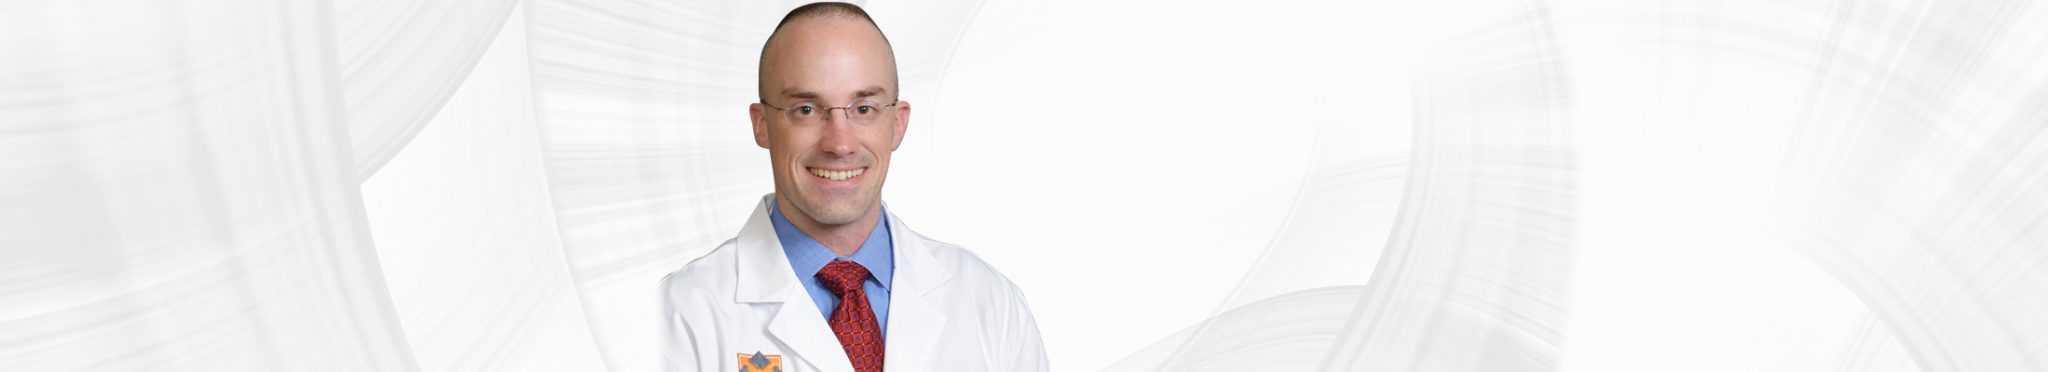 Hoffman -Northwest Oral & Maxillofacial Surgery